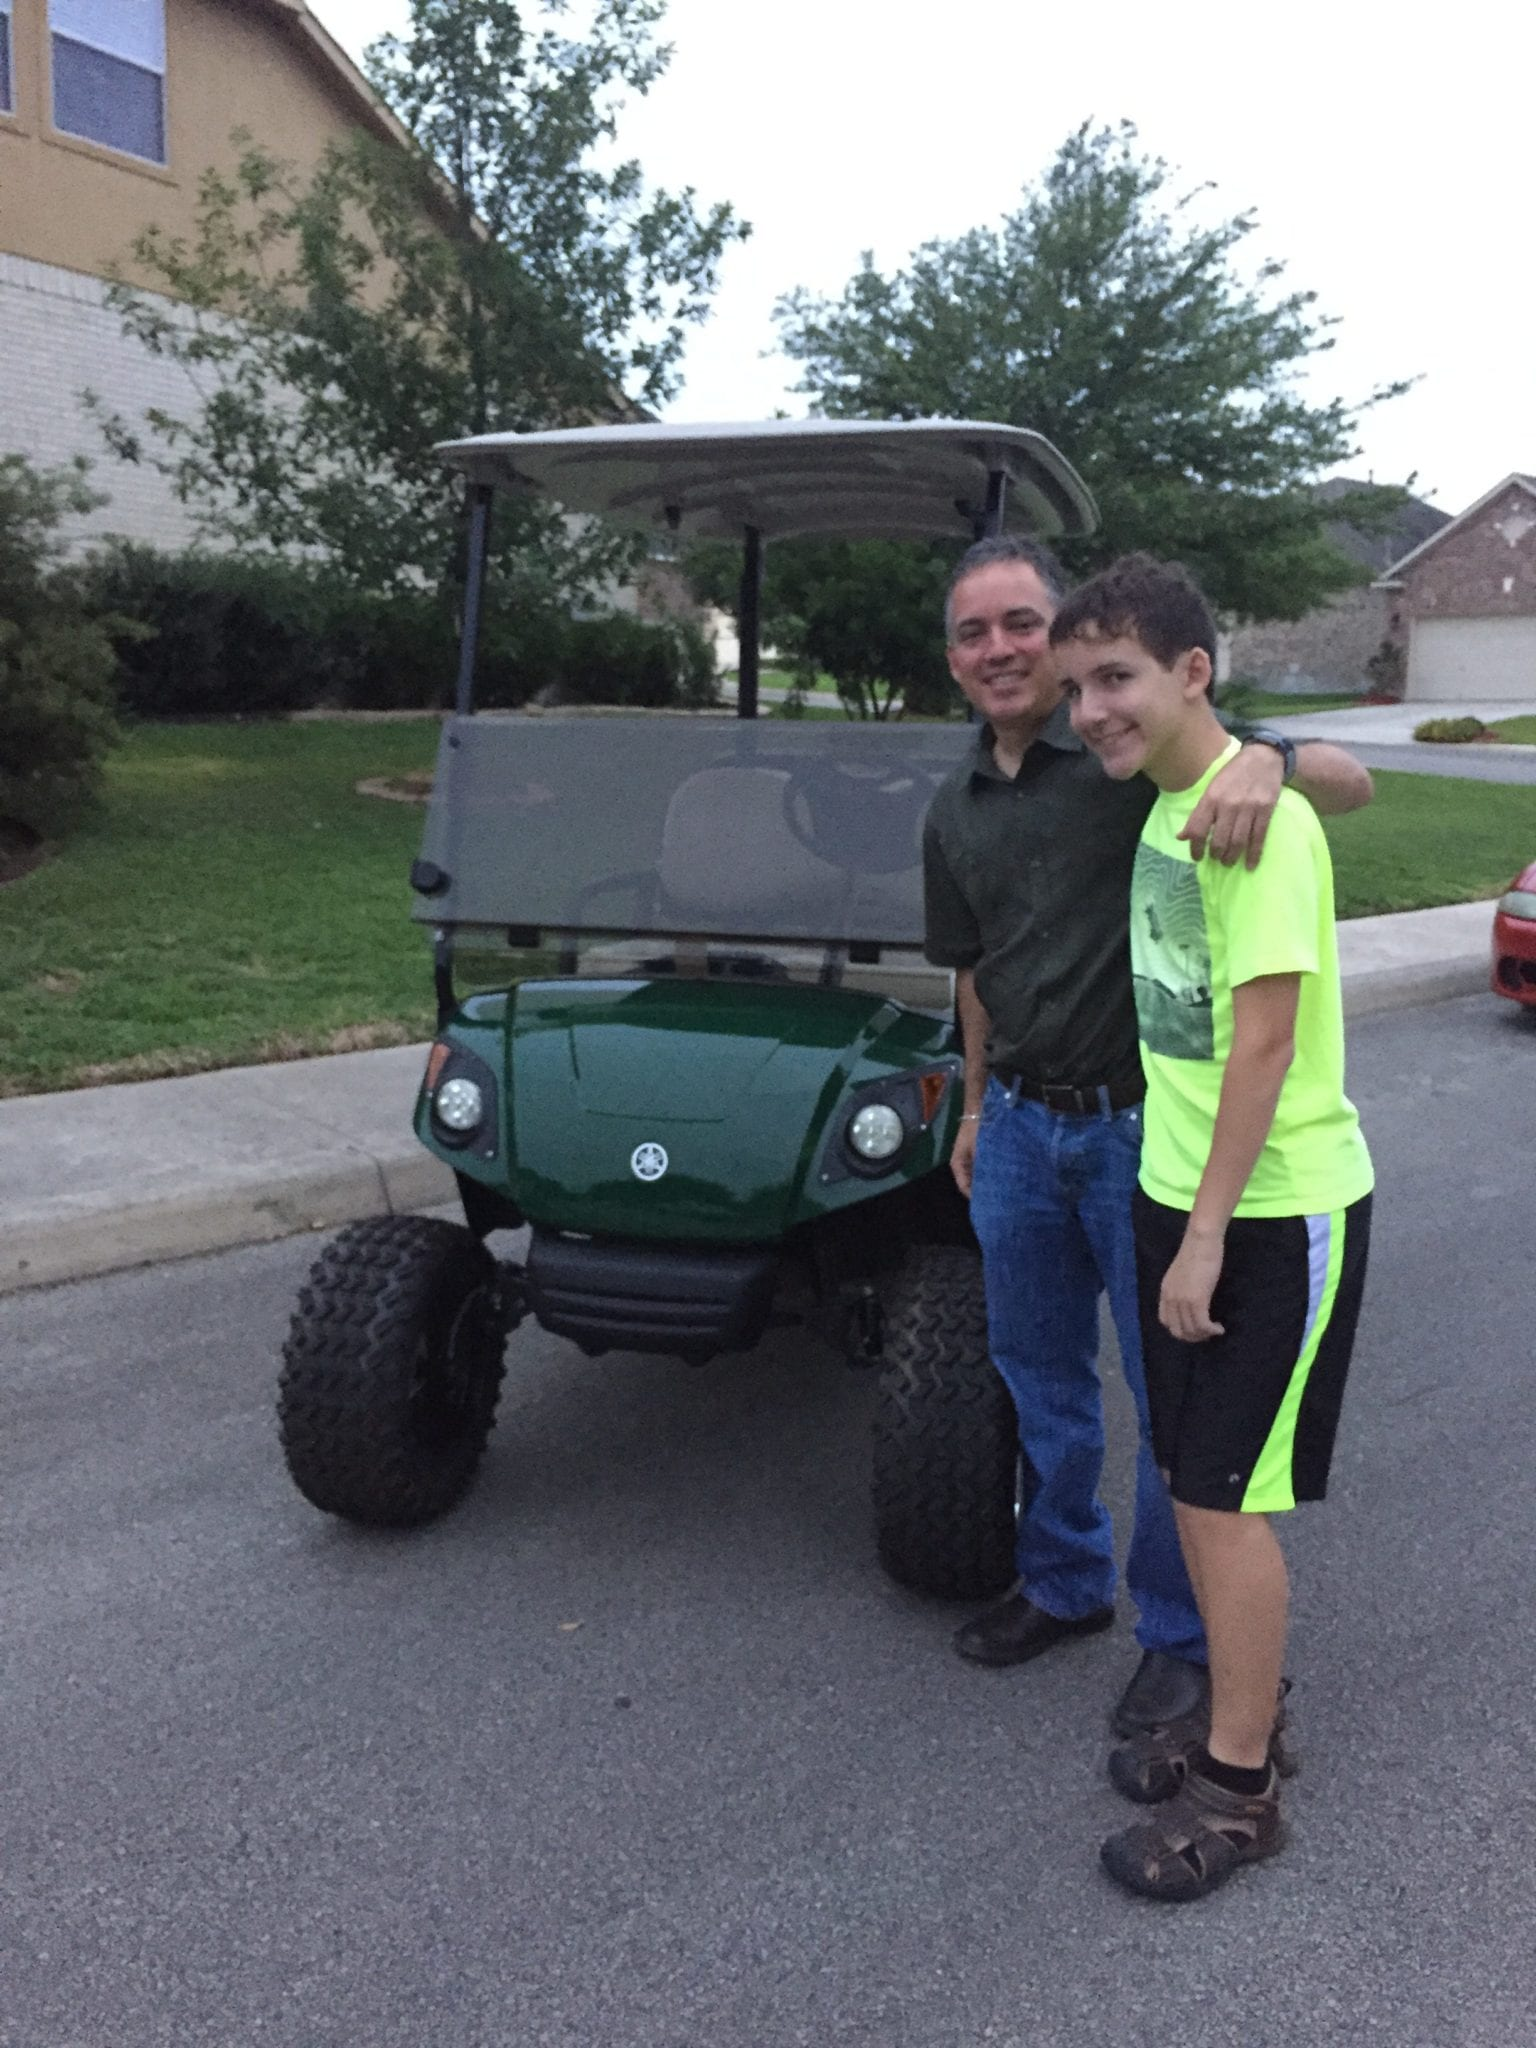 Golf Cart Winner, Ricardo Garza with his son.